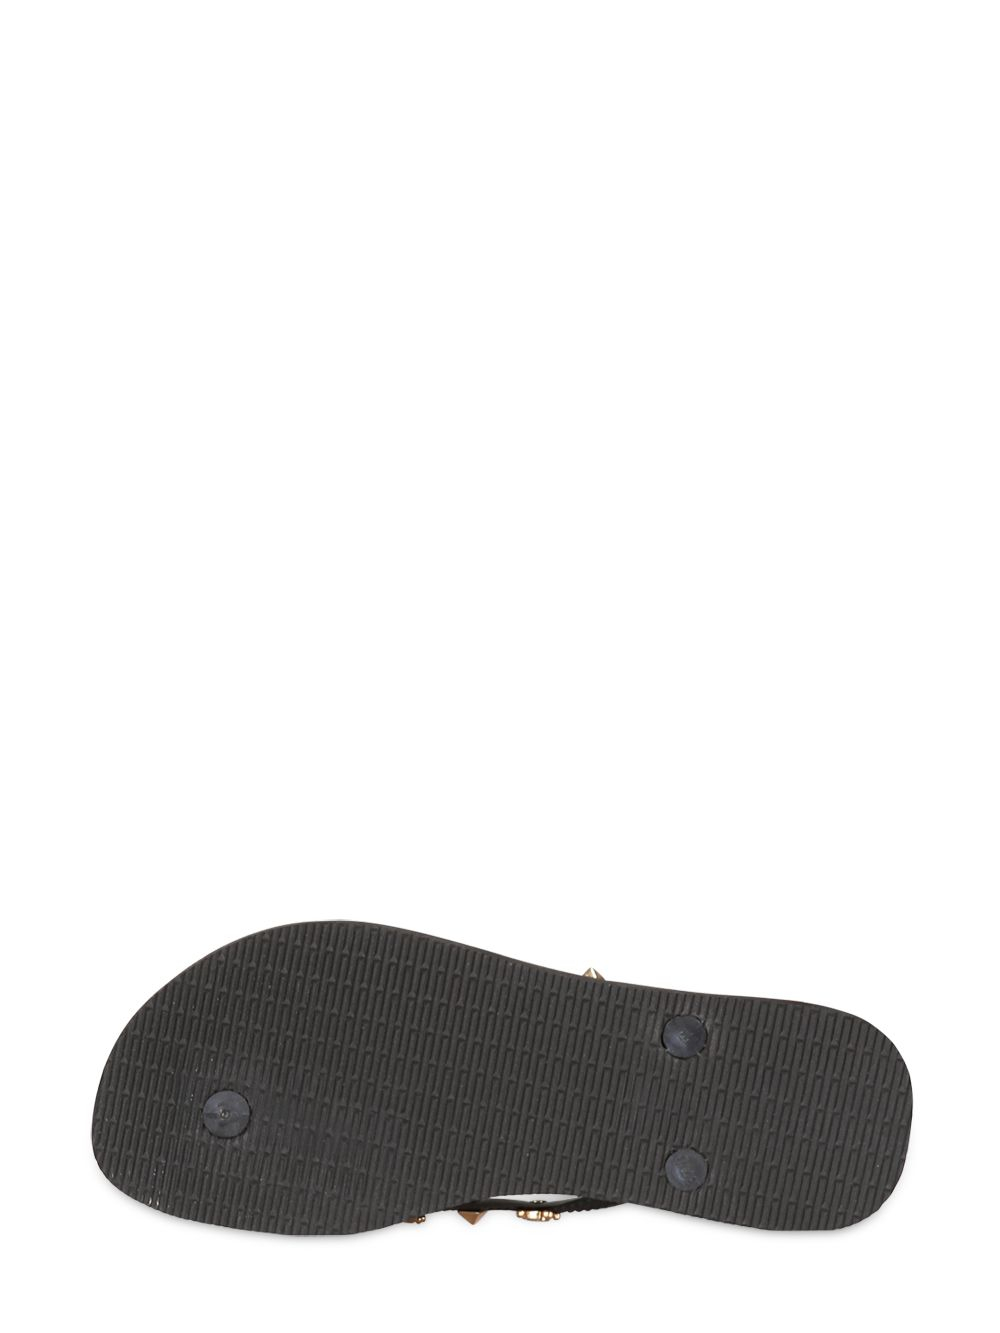 Havaianas Slim Hardware Skull Studs Flip Flop In Black For -5108